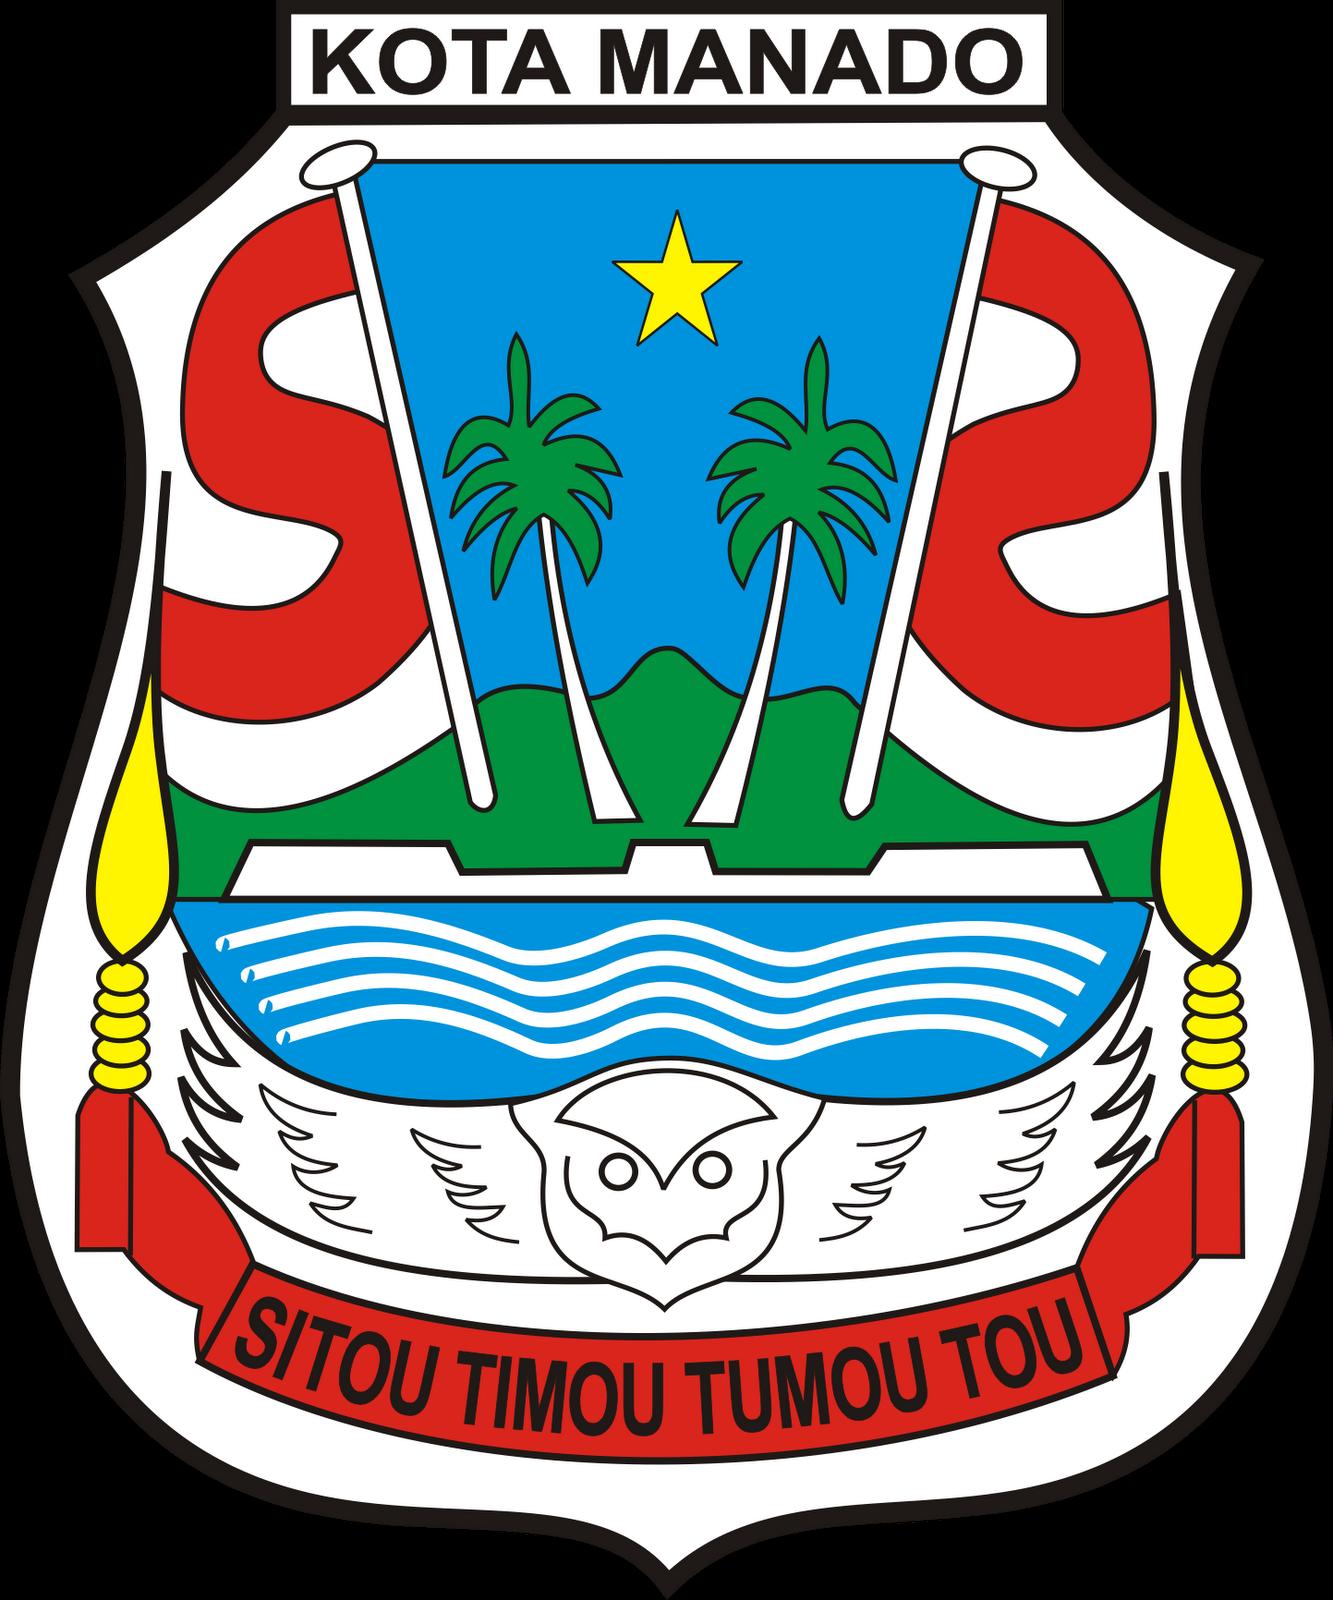 manado - north sulawesi tourism